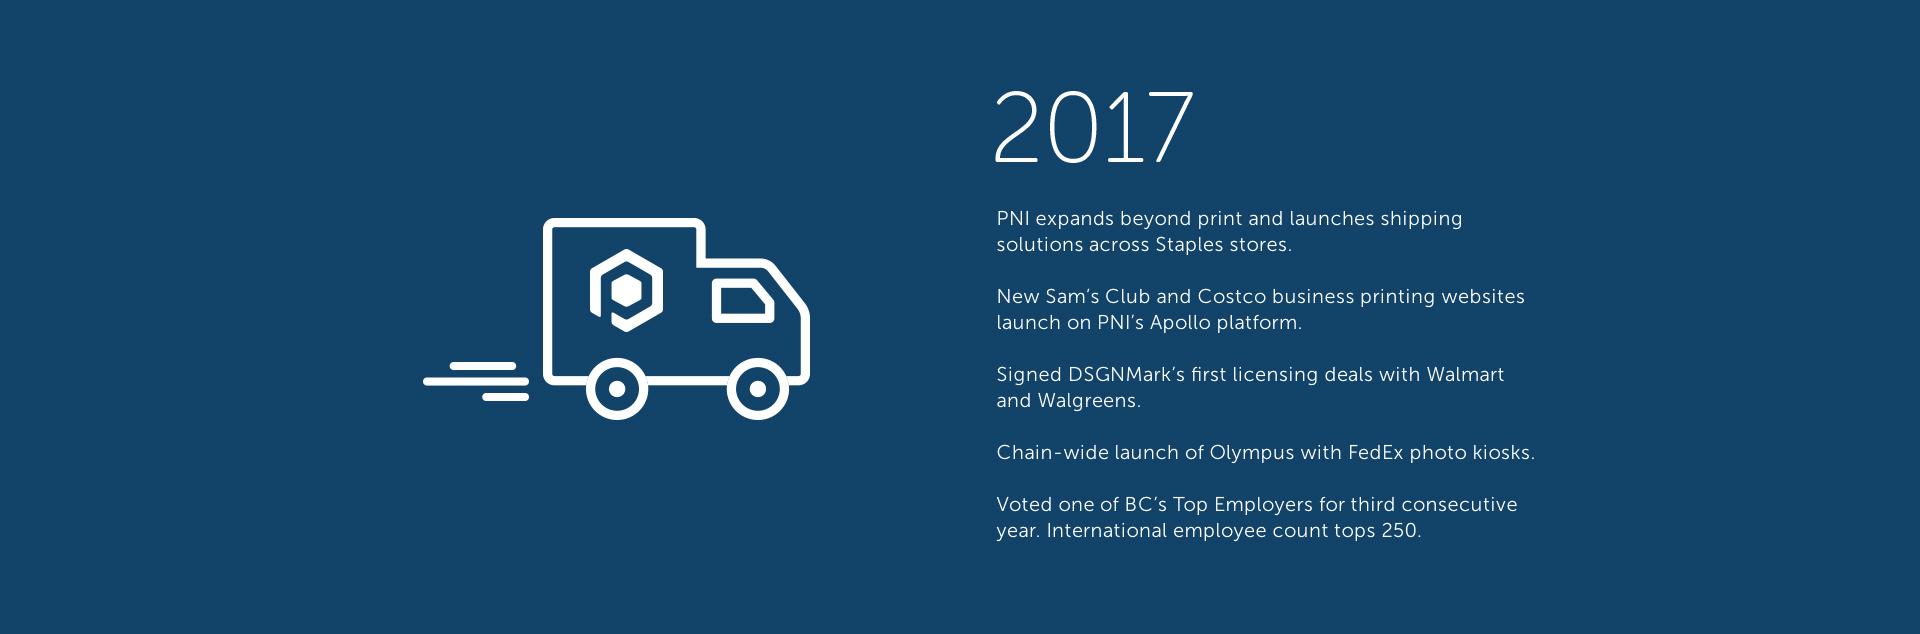 PNI Timeline-2017.jpg